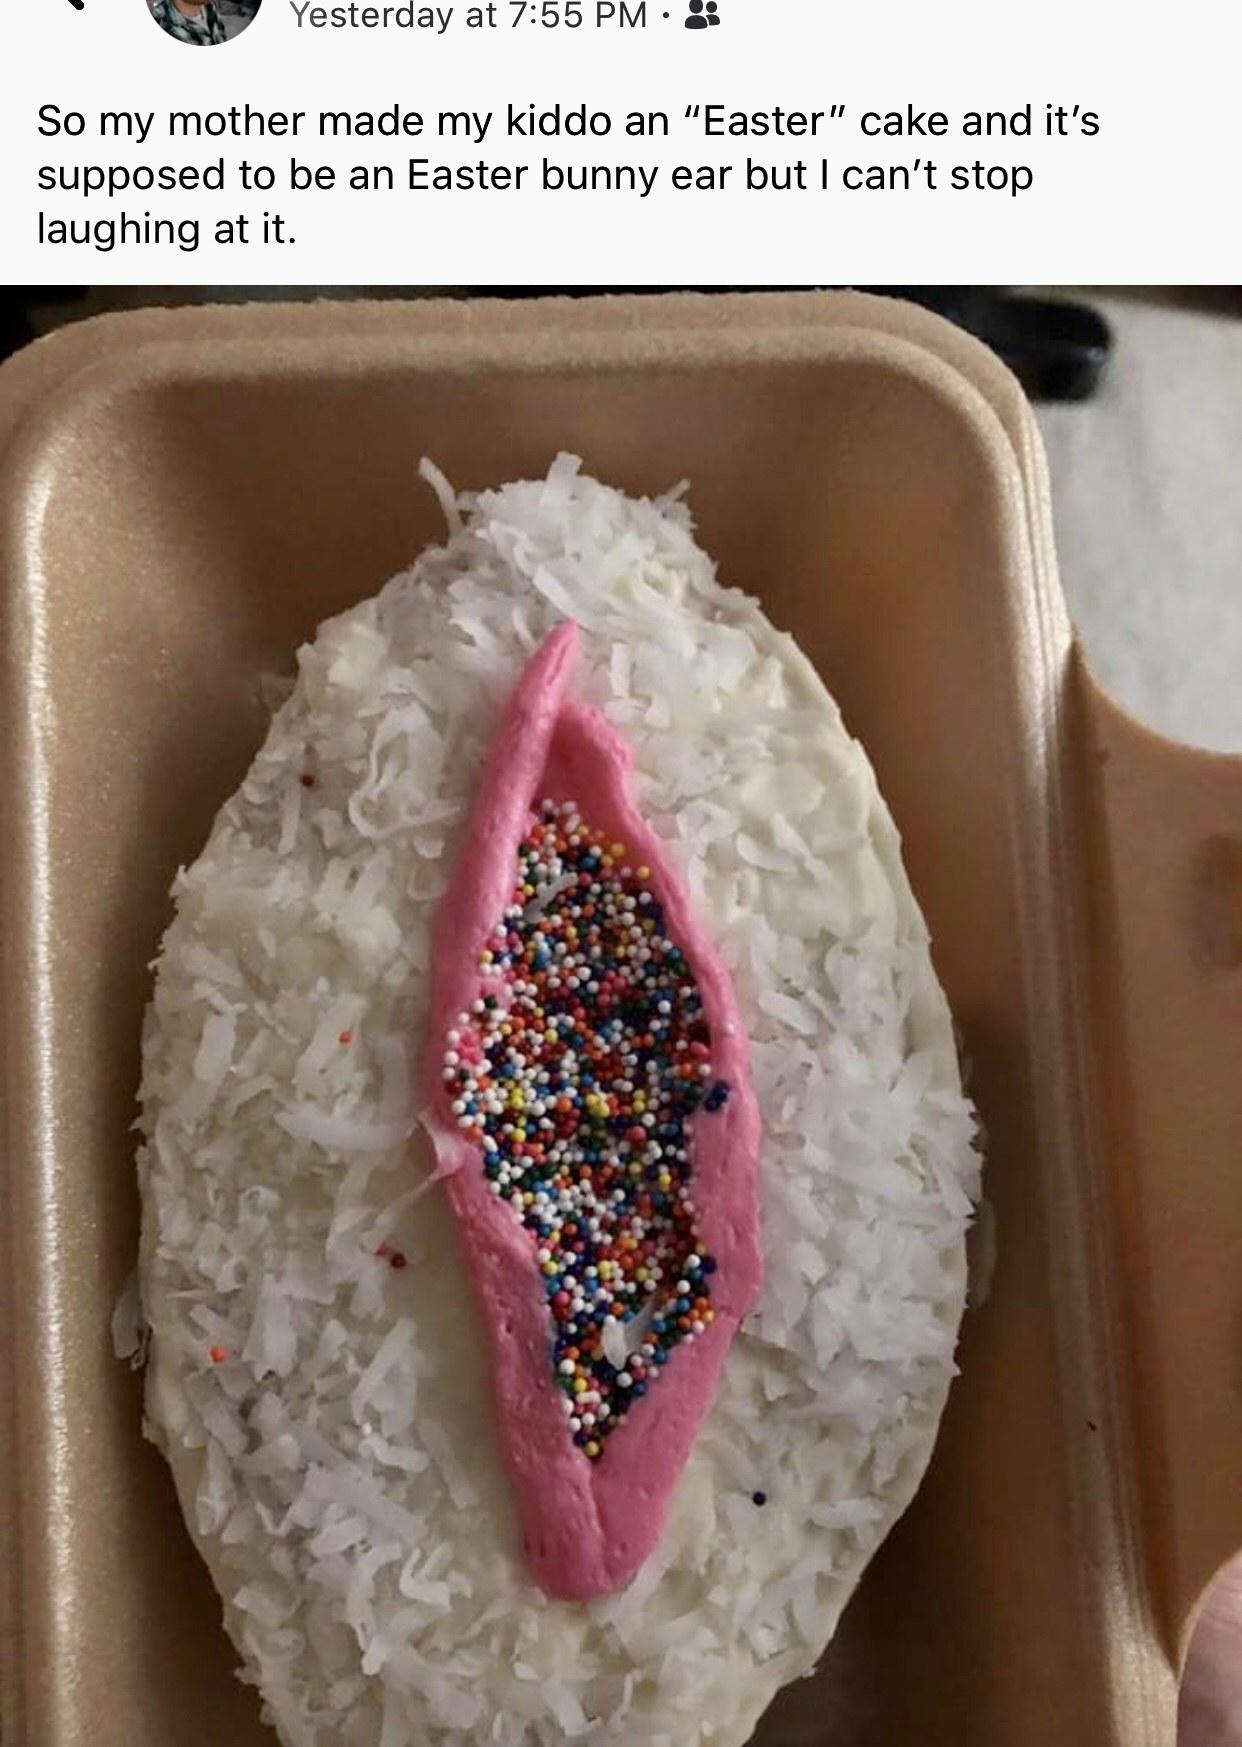 cake that looks suggestive